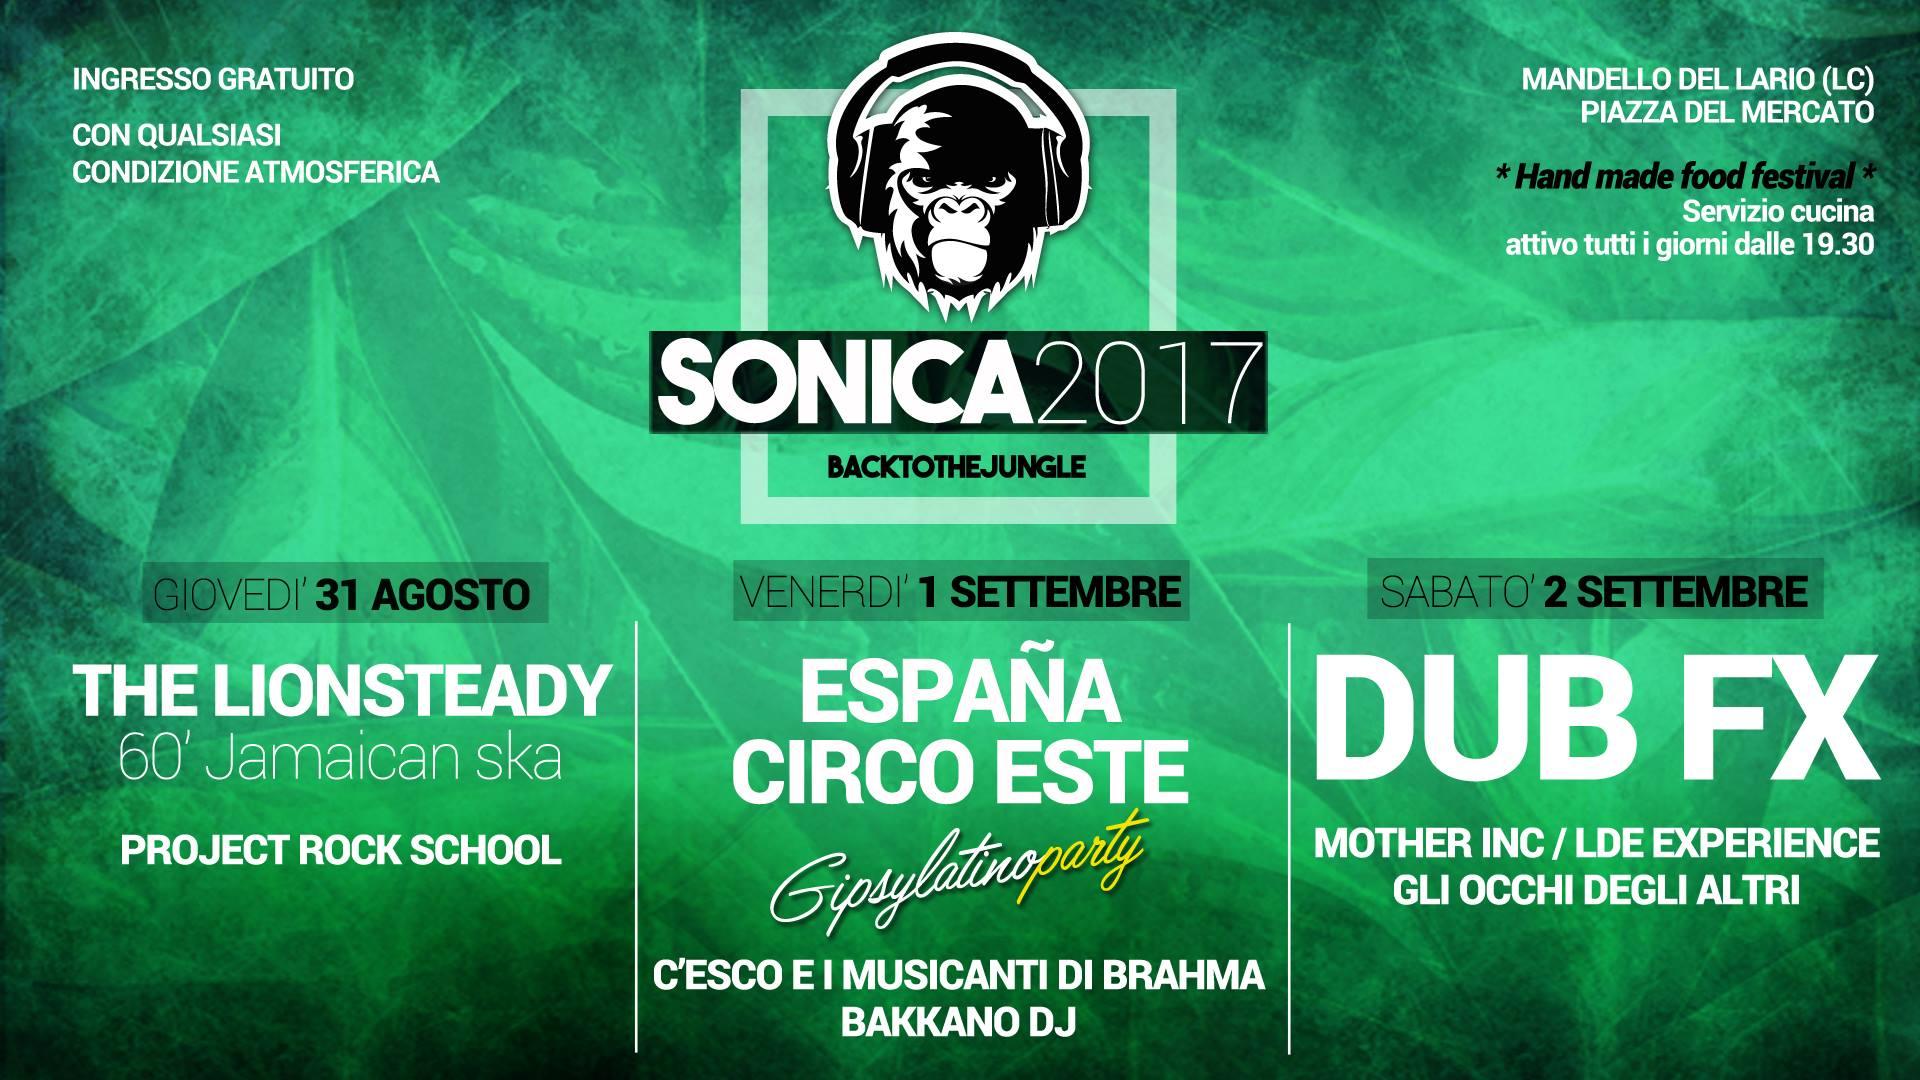 Sonica 2017